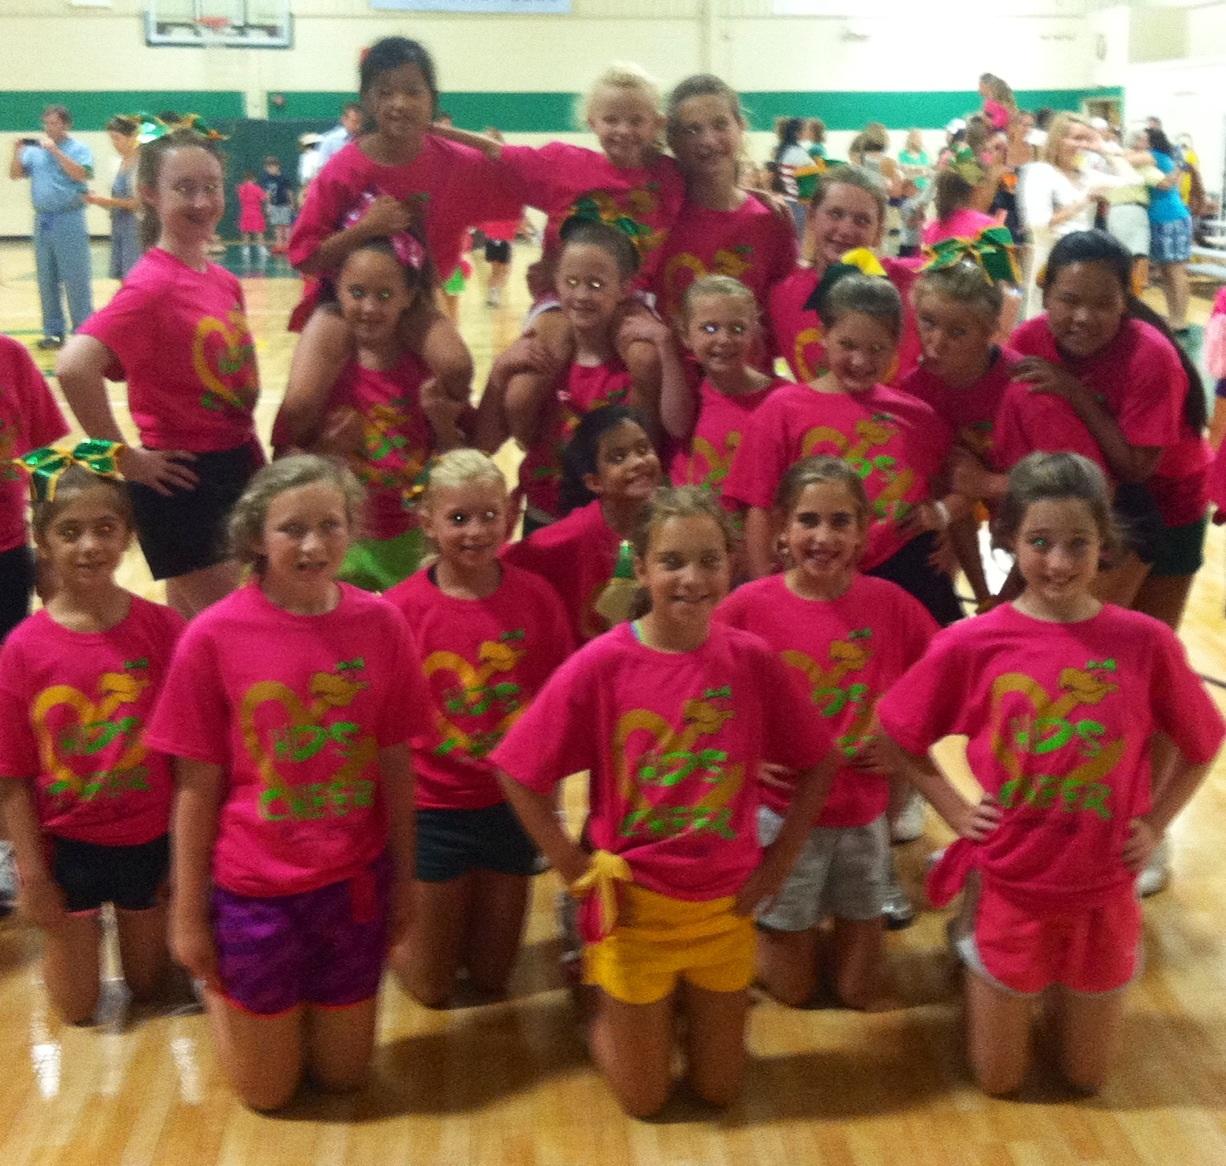 hds mini cheer camp t shirt photo - Cheer Shirt Design Ideas